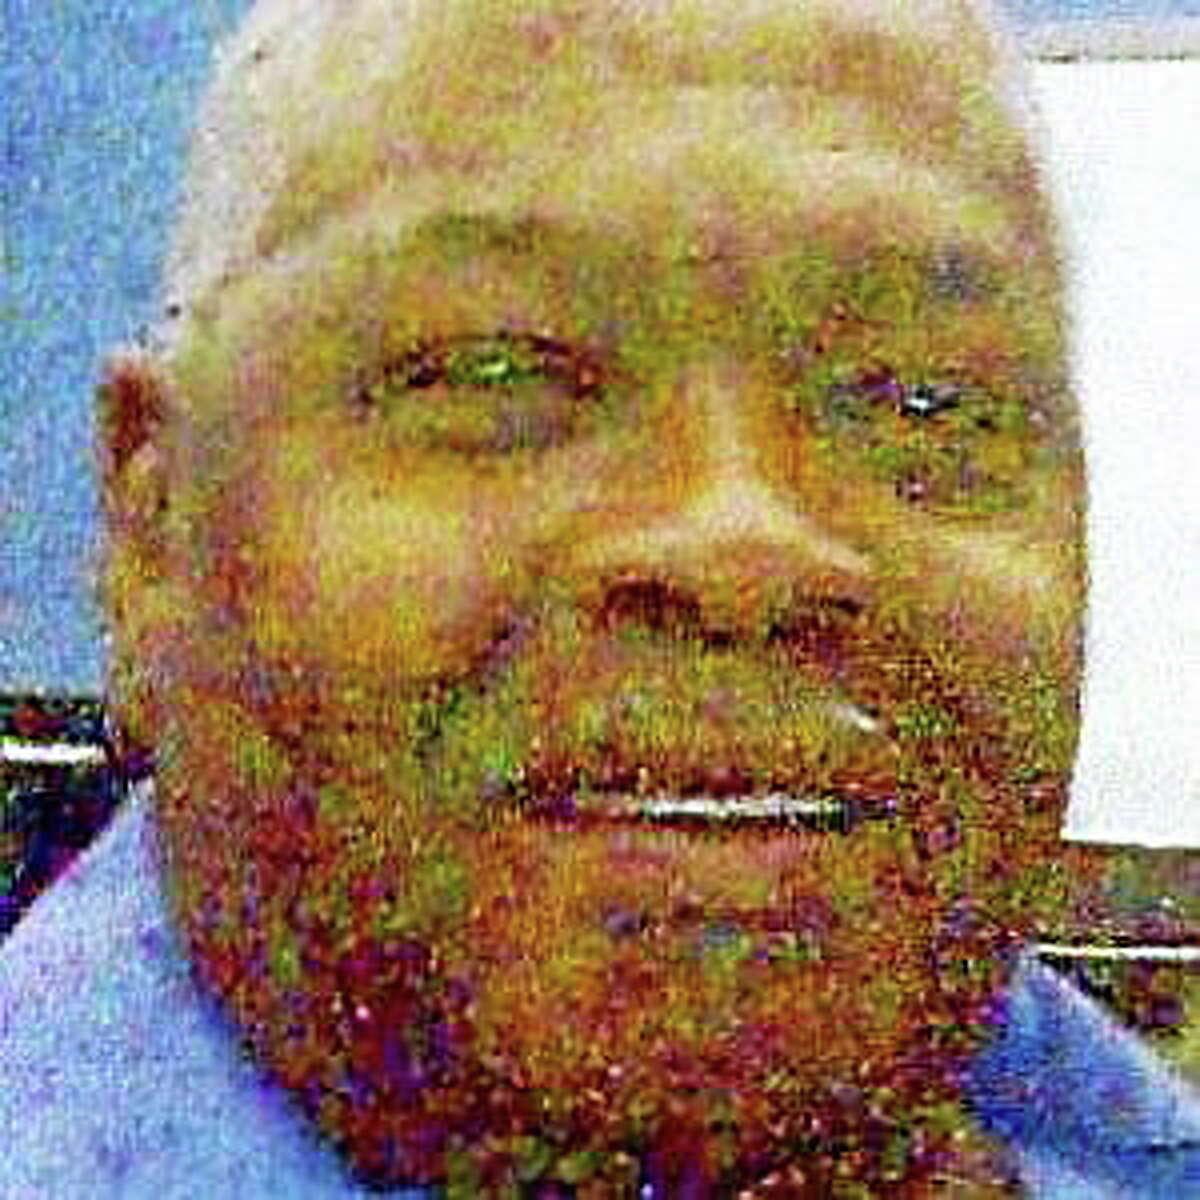 Robert Williams of Meriden died of carbon monoxide poisoning at Custom Carpets in Middletown.